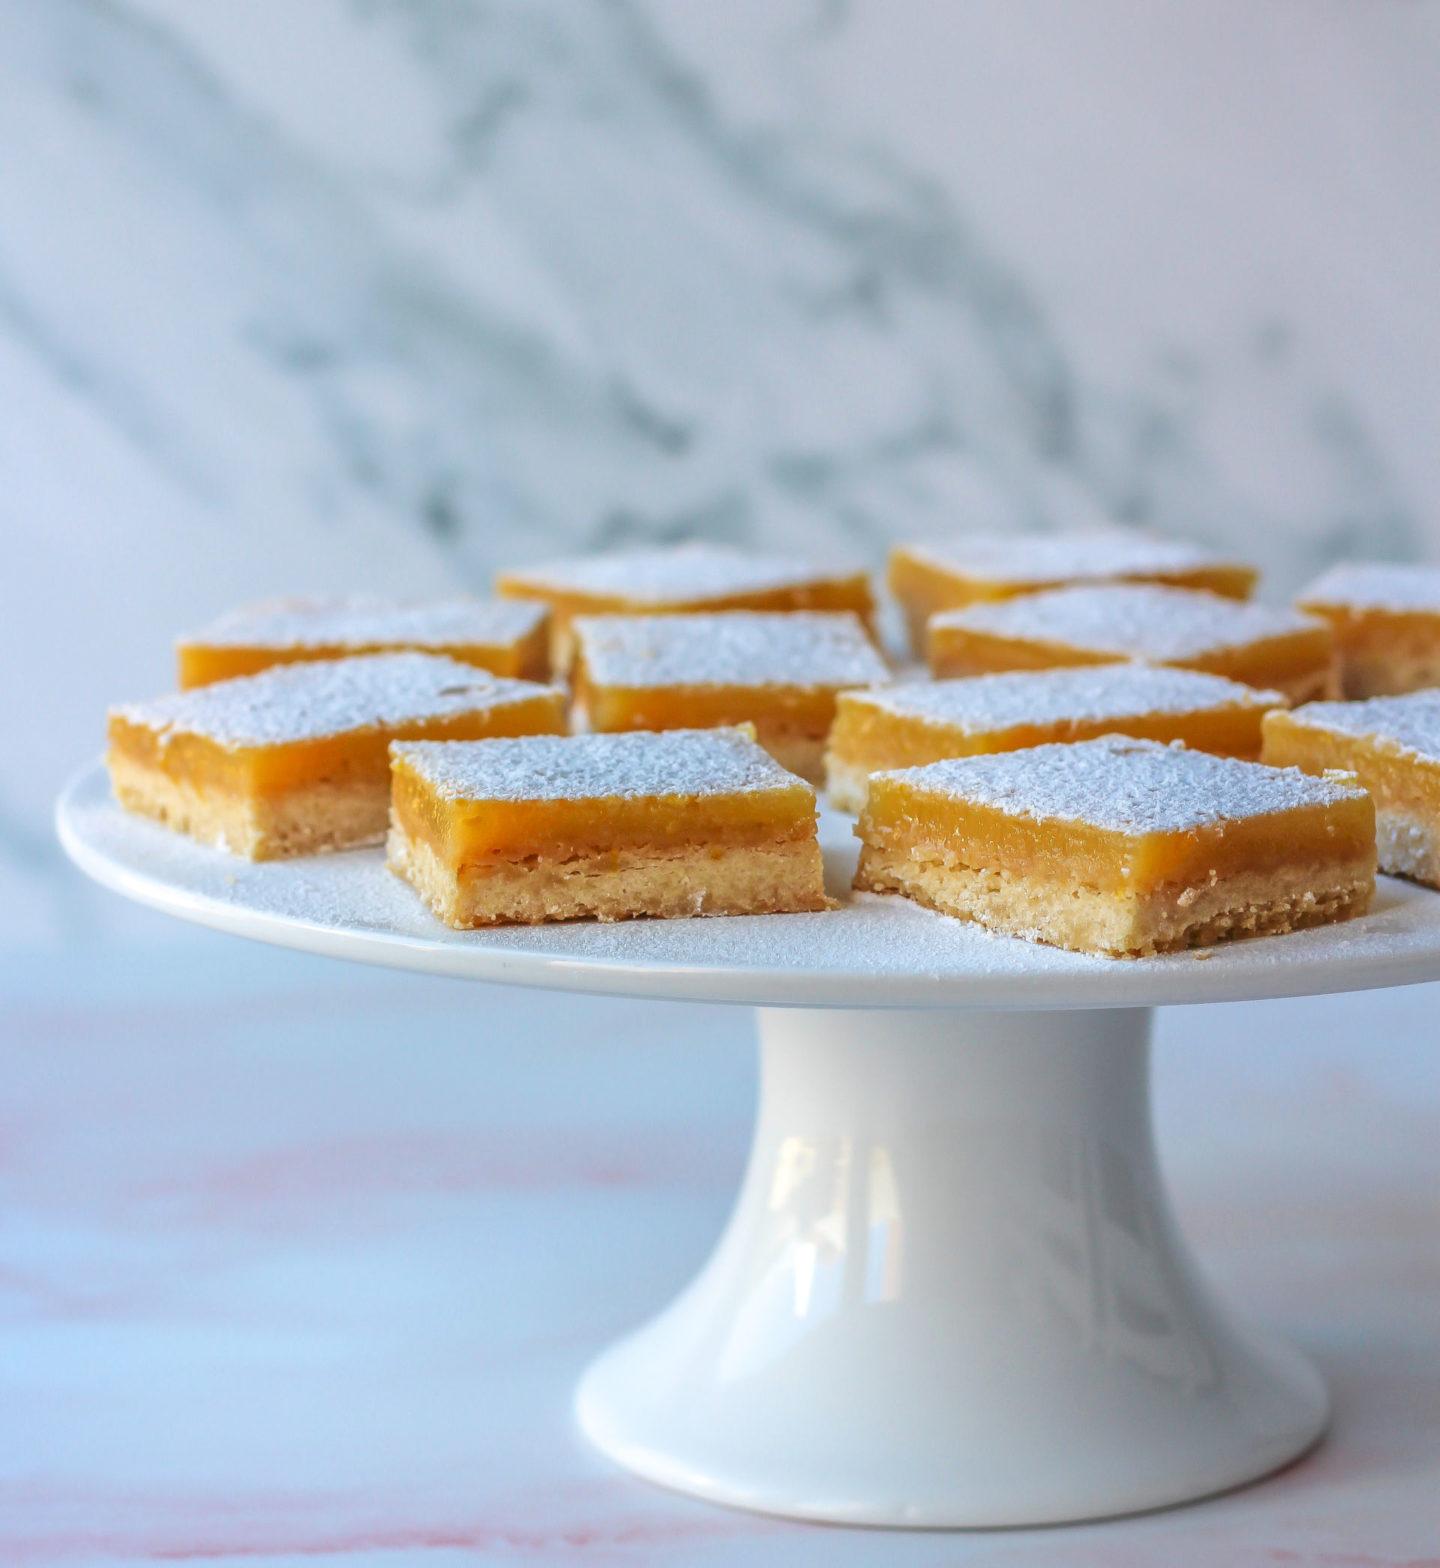 cake stand of lemon bars